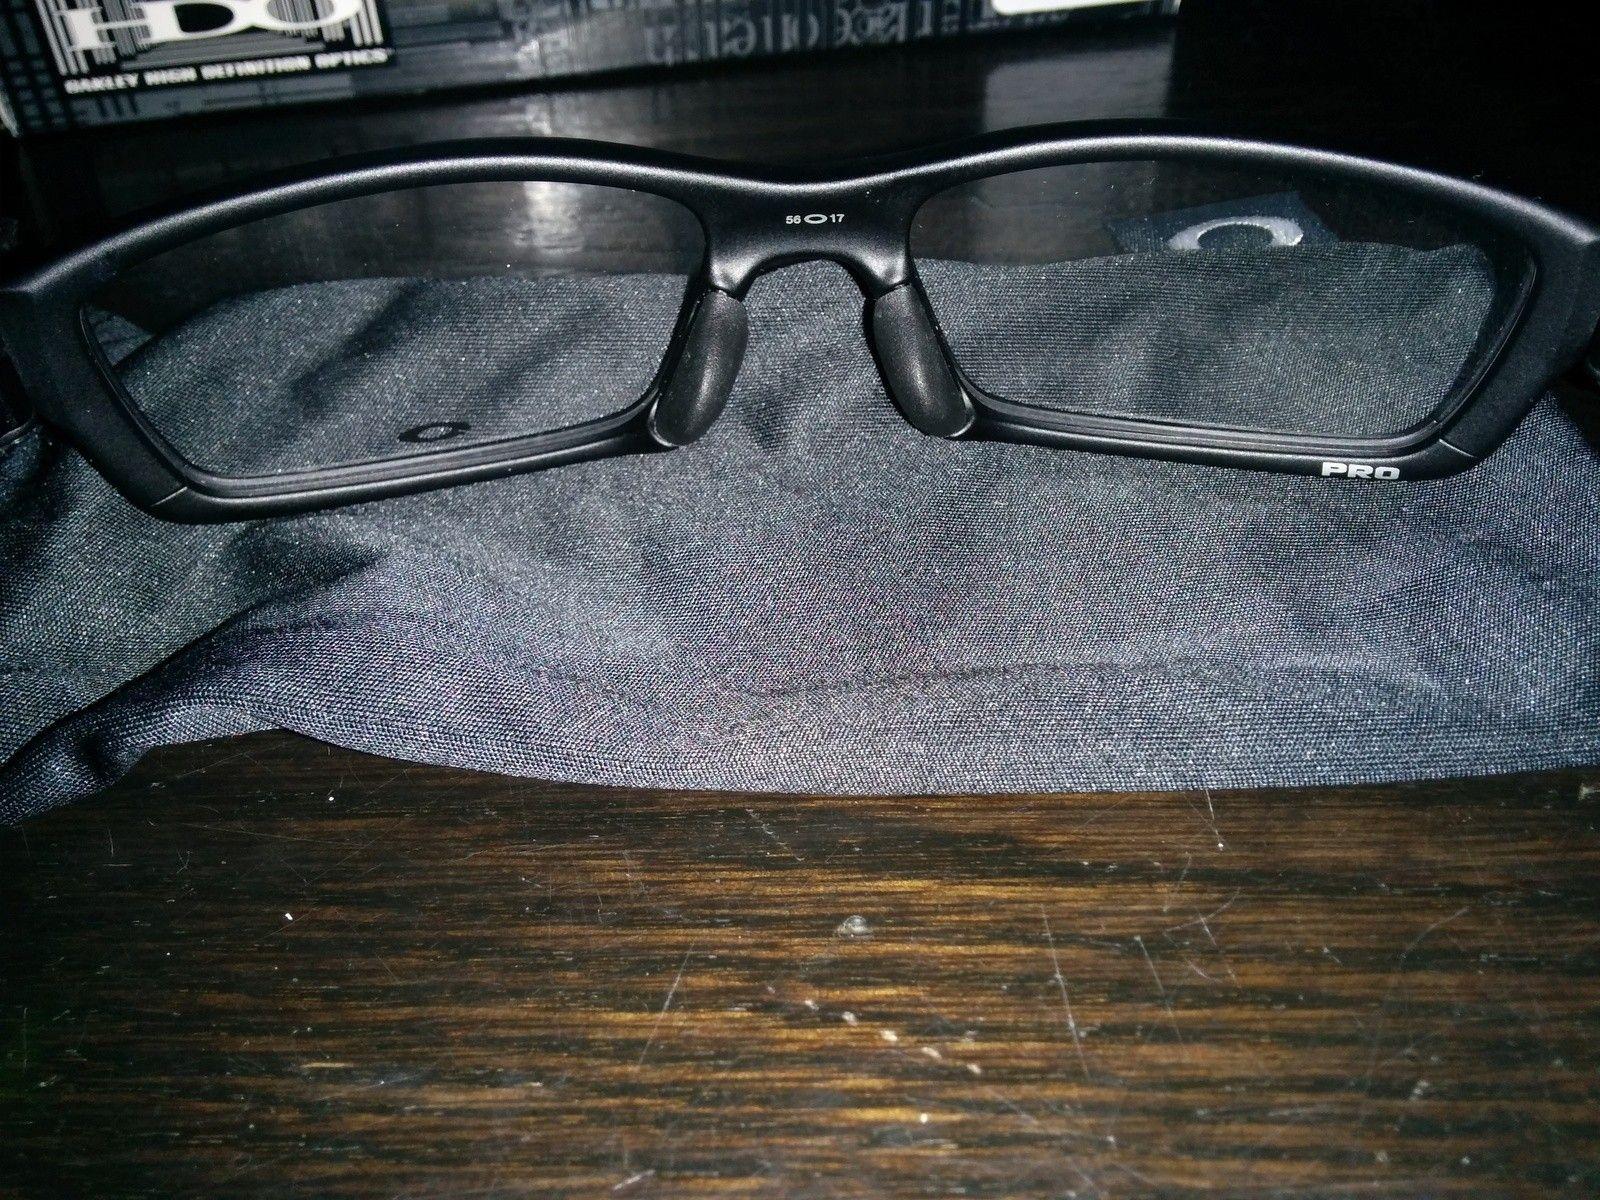 Crosslink Pro A (56) Satin black / Retina burn - uploadfromtaptalk1450212036187.jpg